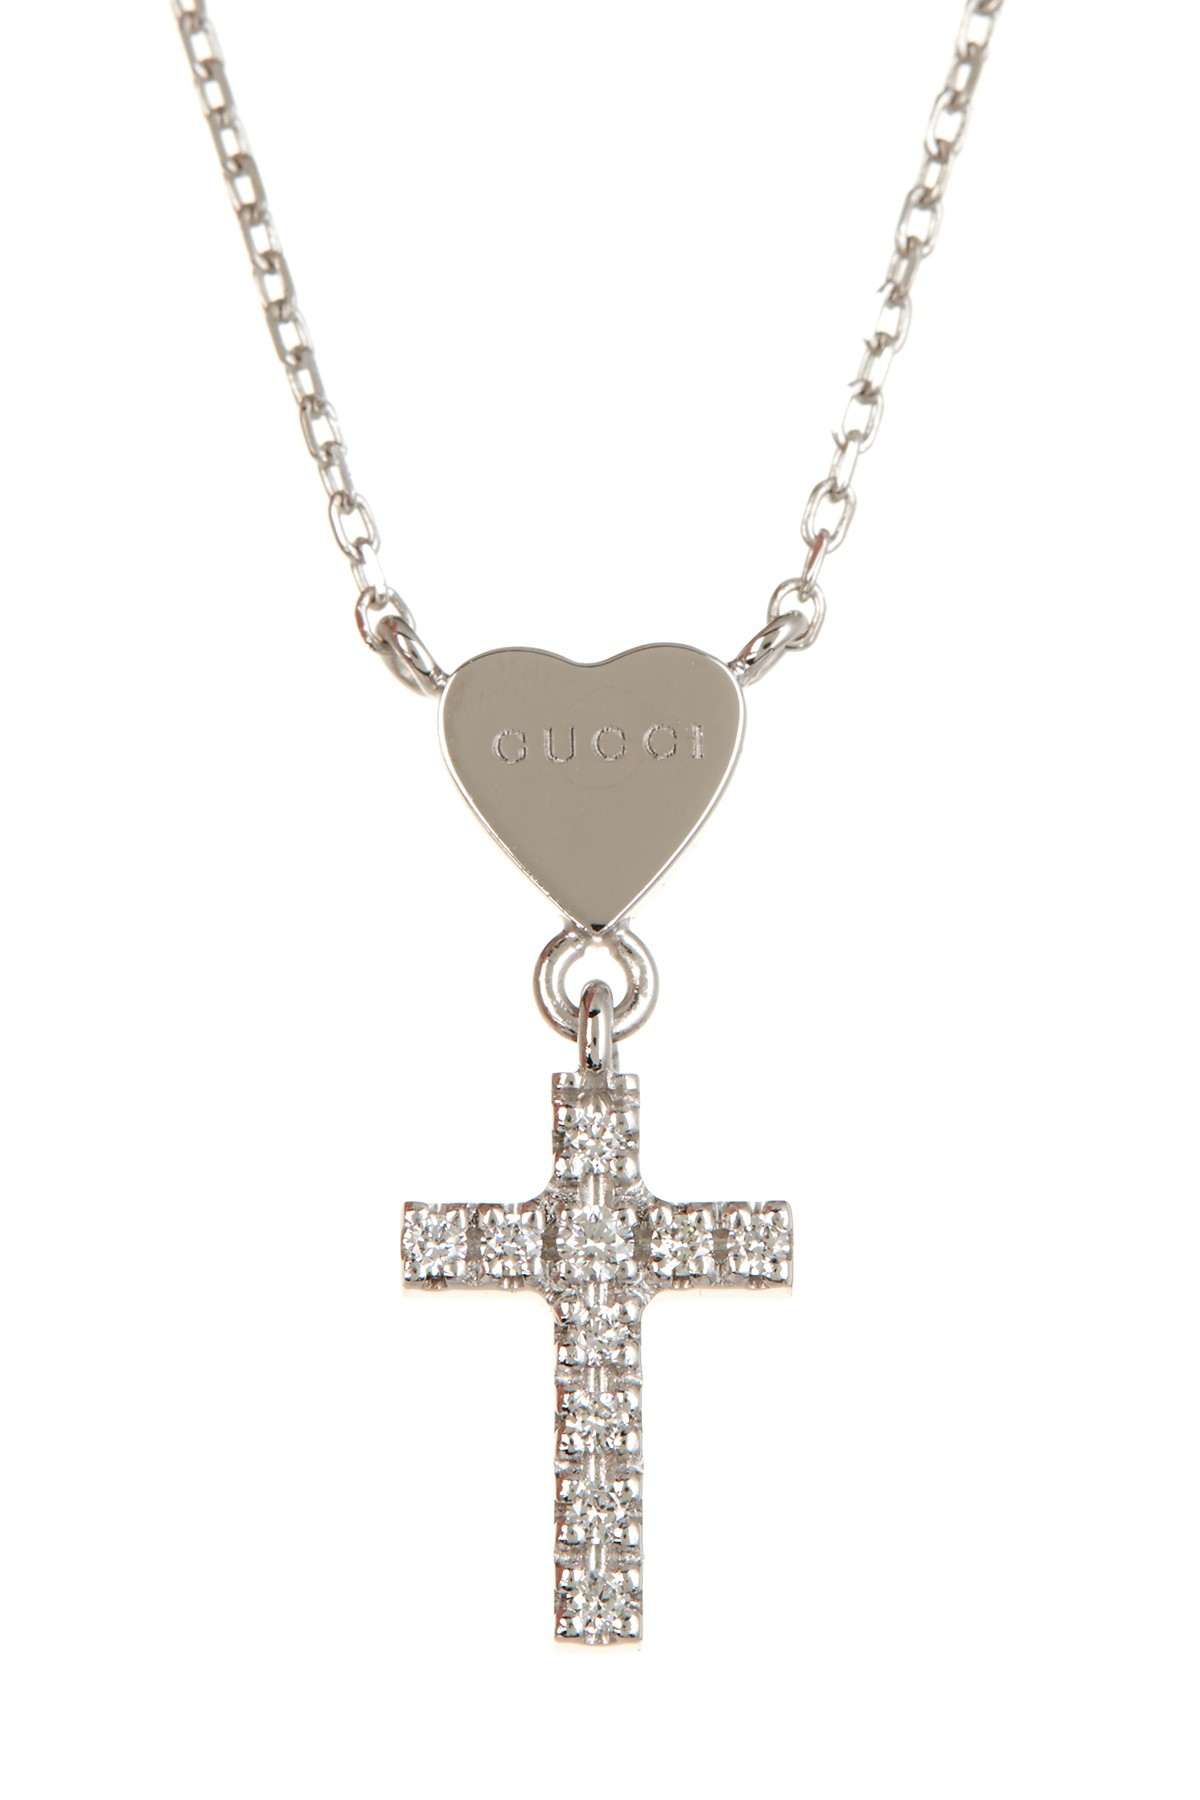 58ed22237 Gucci 18k White Gold Trademark Heart & Diamond Cross Pendant ...